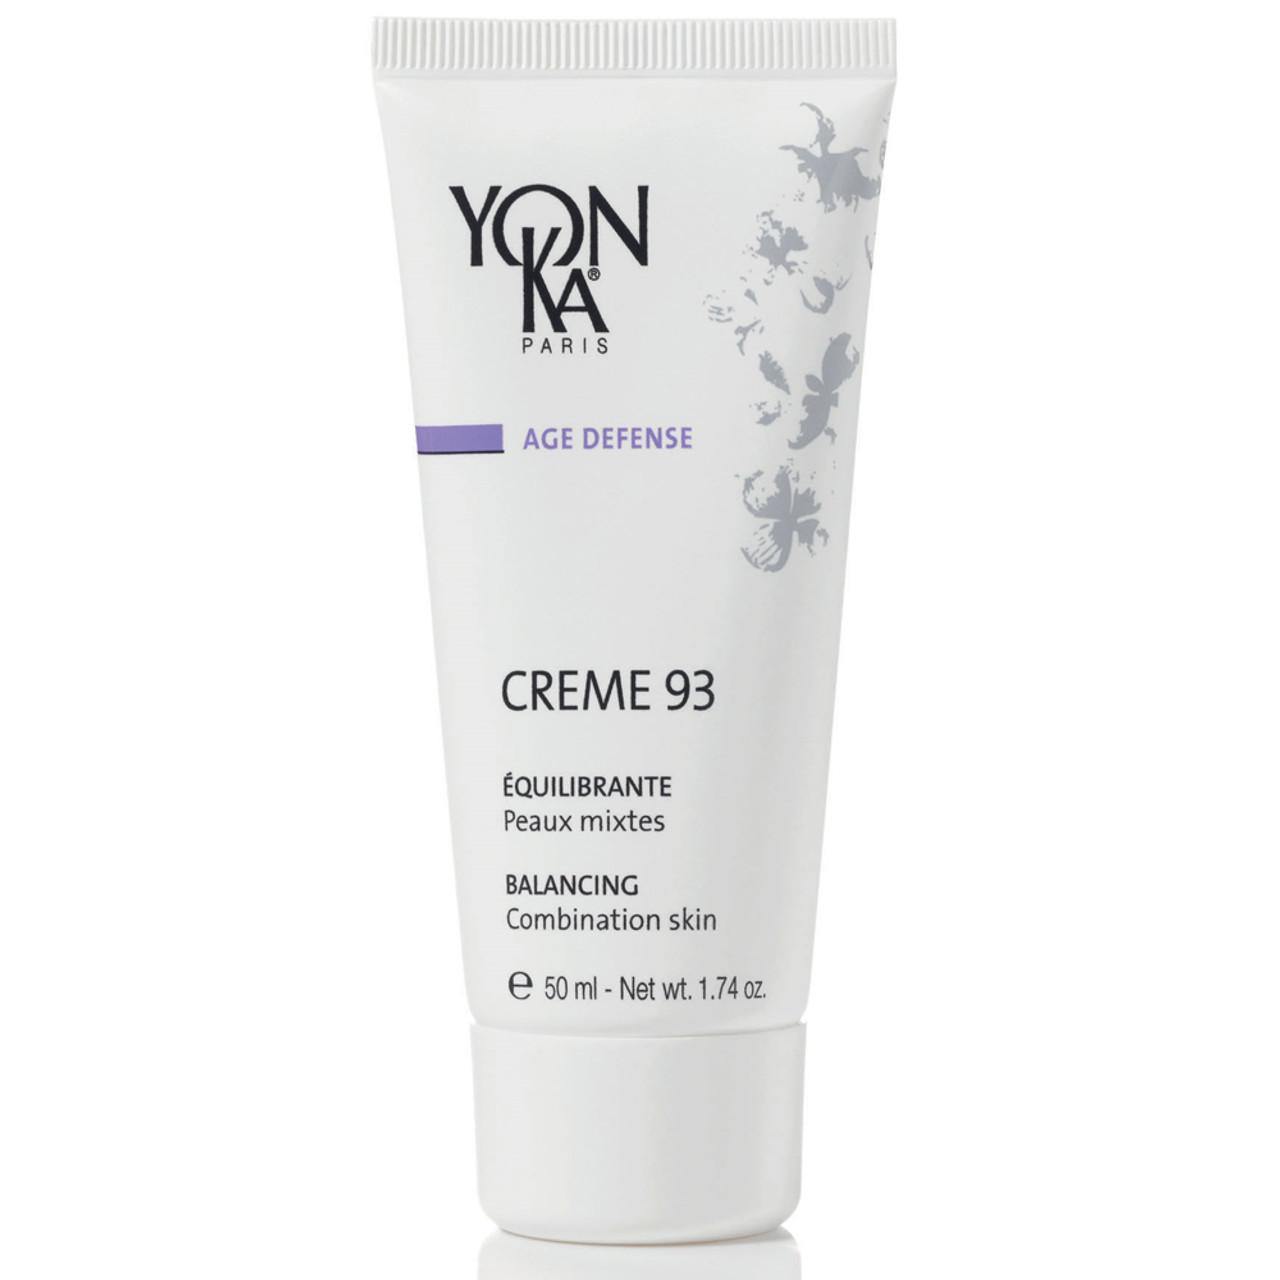 YonKa Creme 93 Balancing Cream